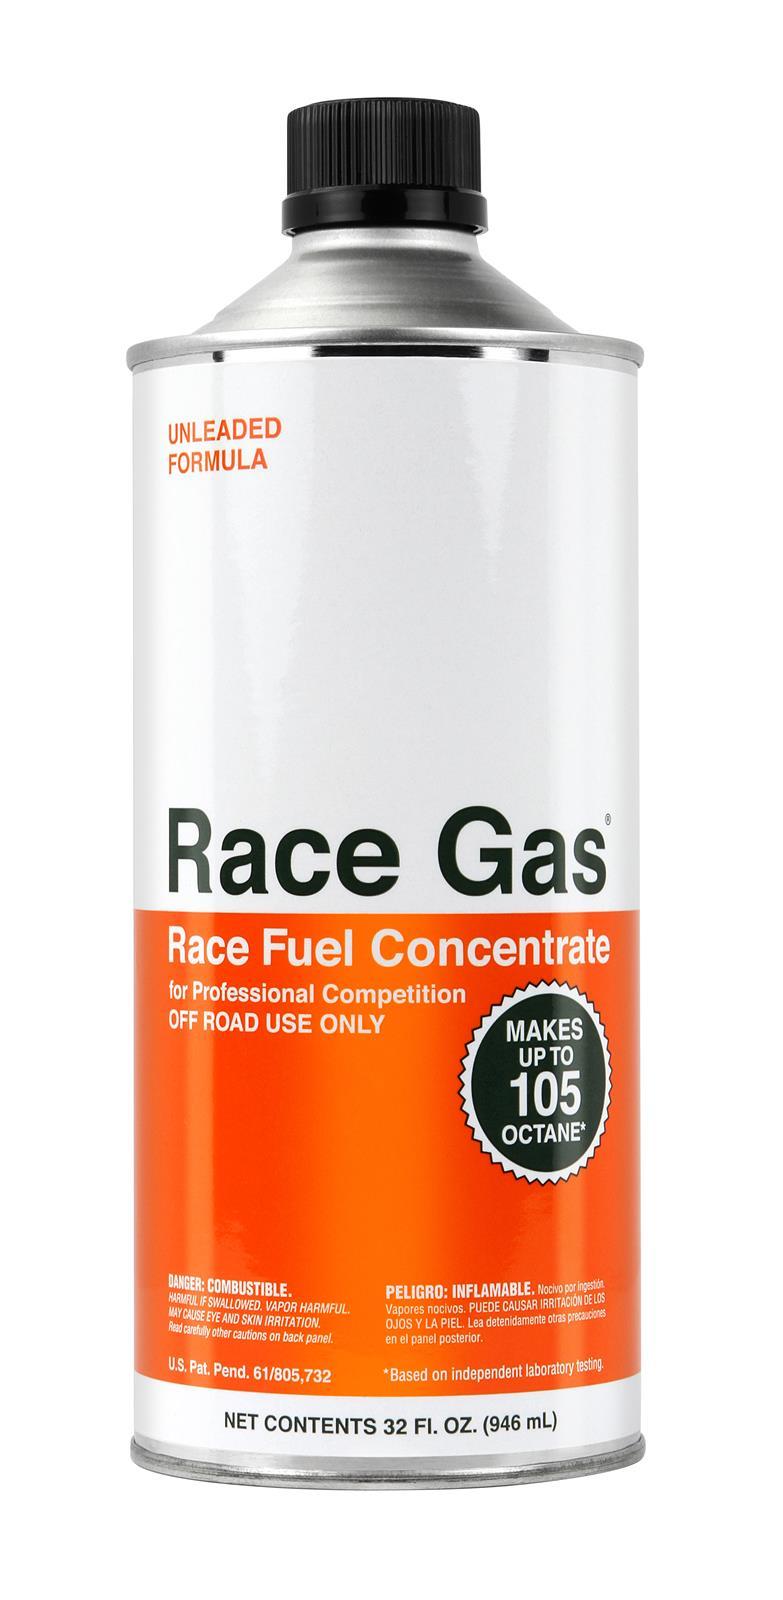 Race Gas Race Fuel Concentrate 100032